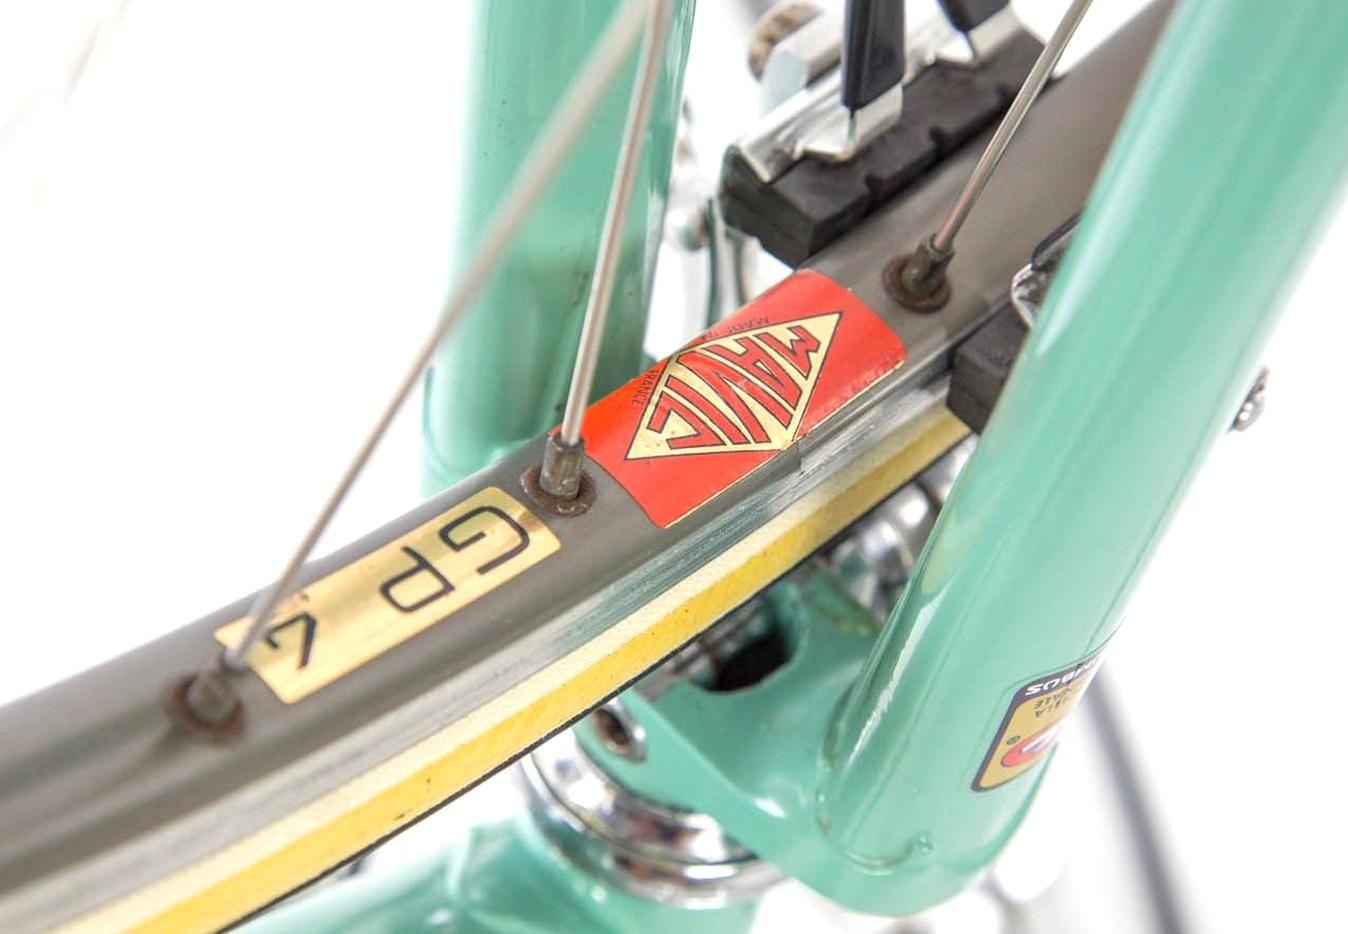 Steel Vintage Bikes Bianchi Superleggera Classic Road Bike 1982 In 2020 Classic Road Bike Road Bike Superleggera